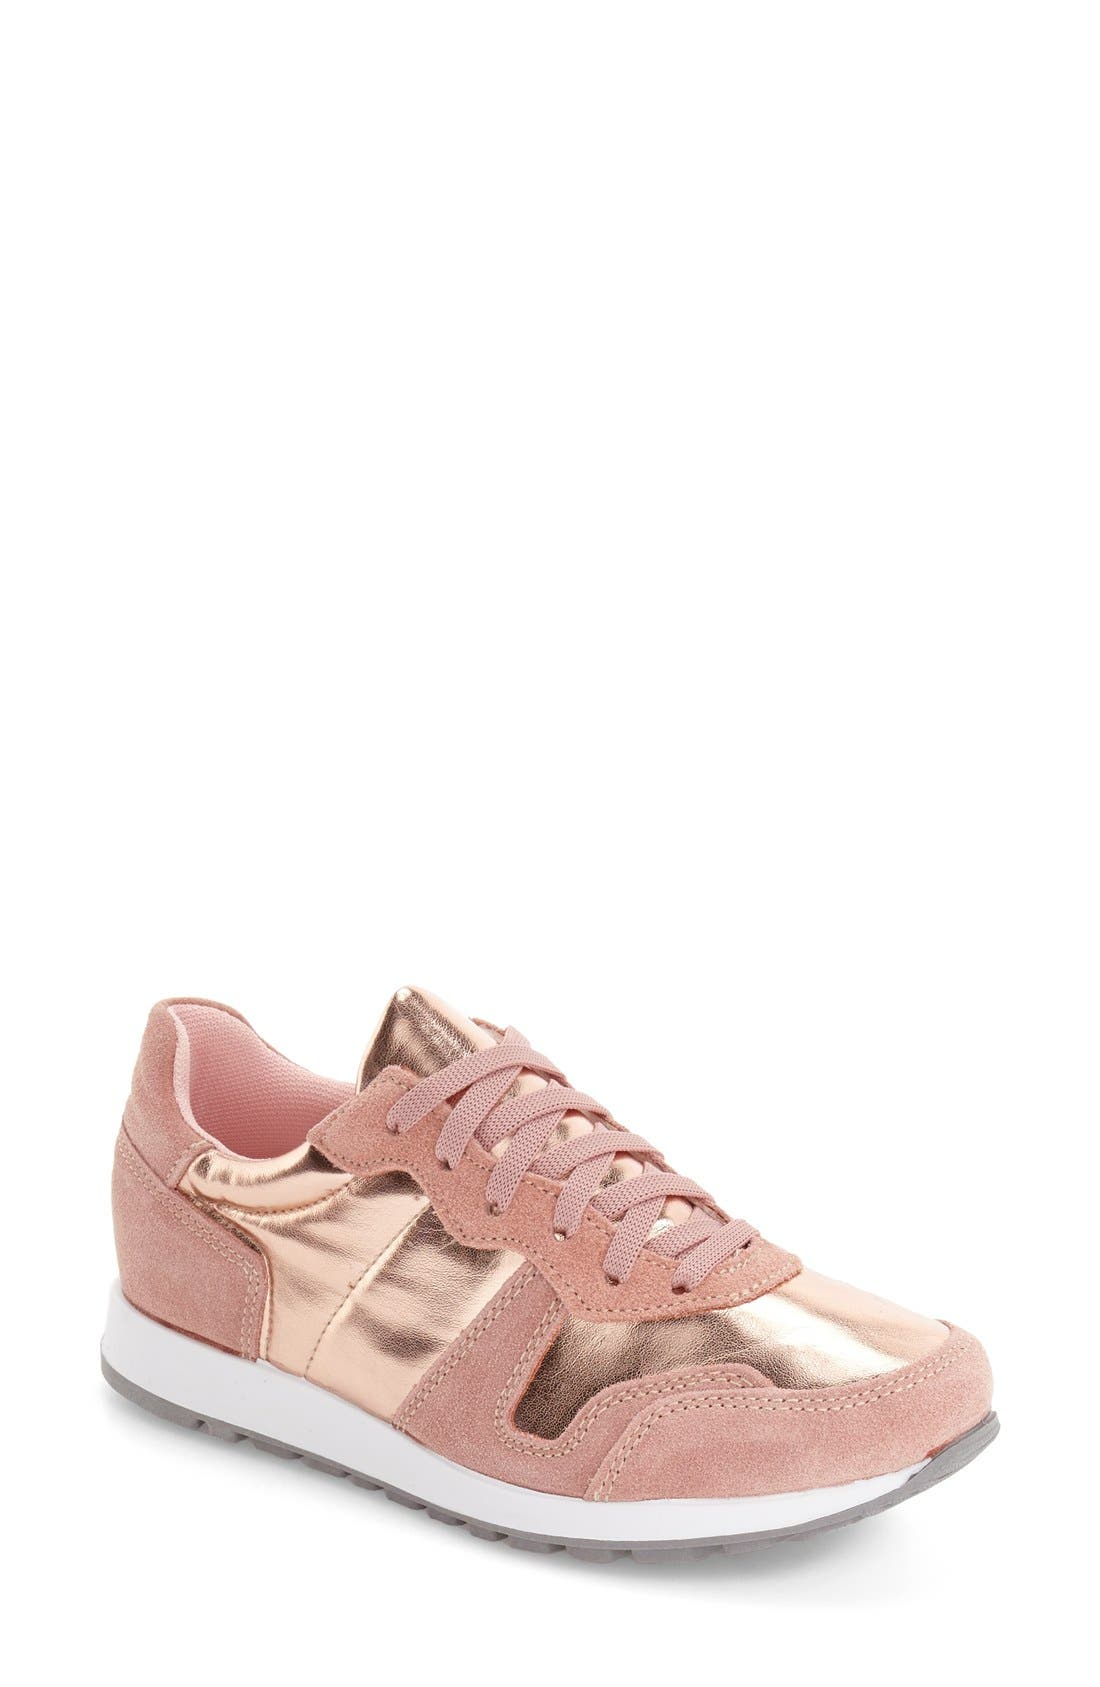 Main Image - Topshop Charlie Sneaker (Women)